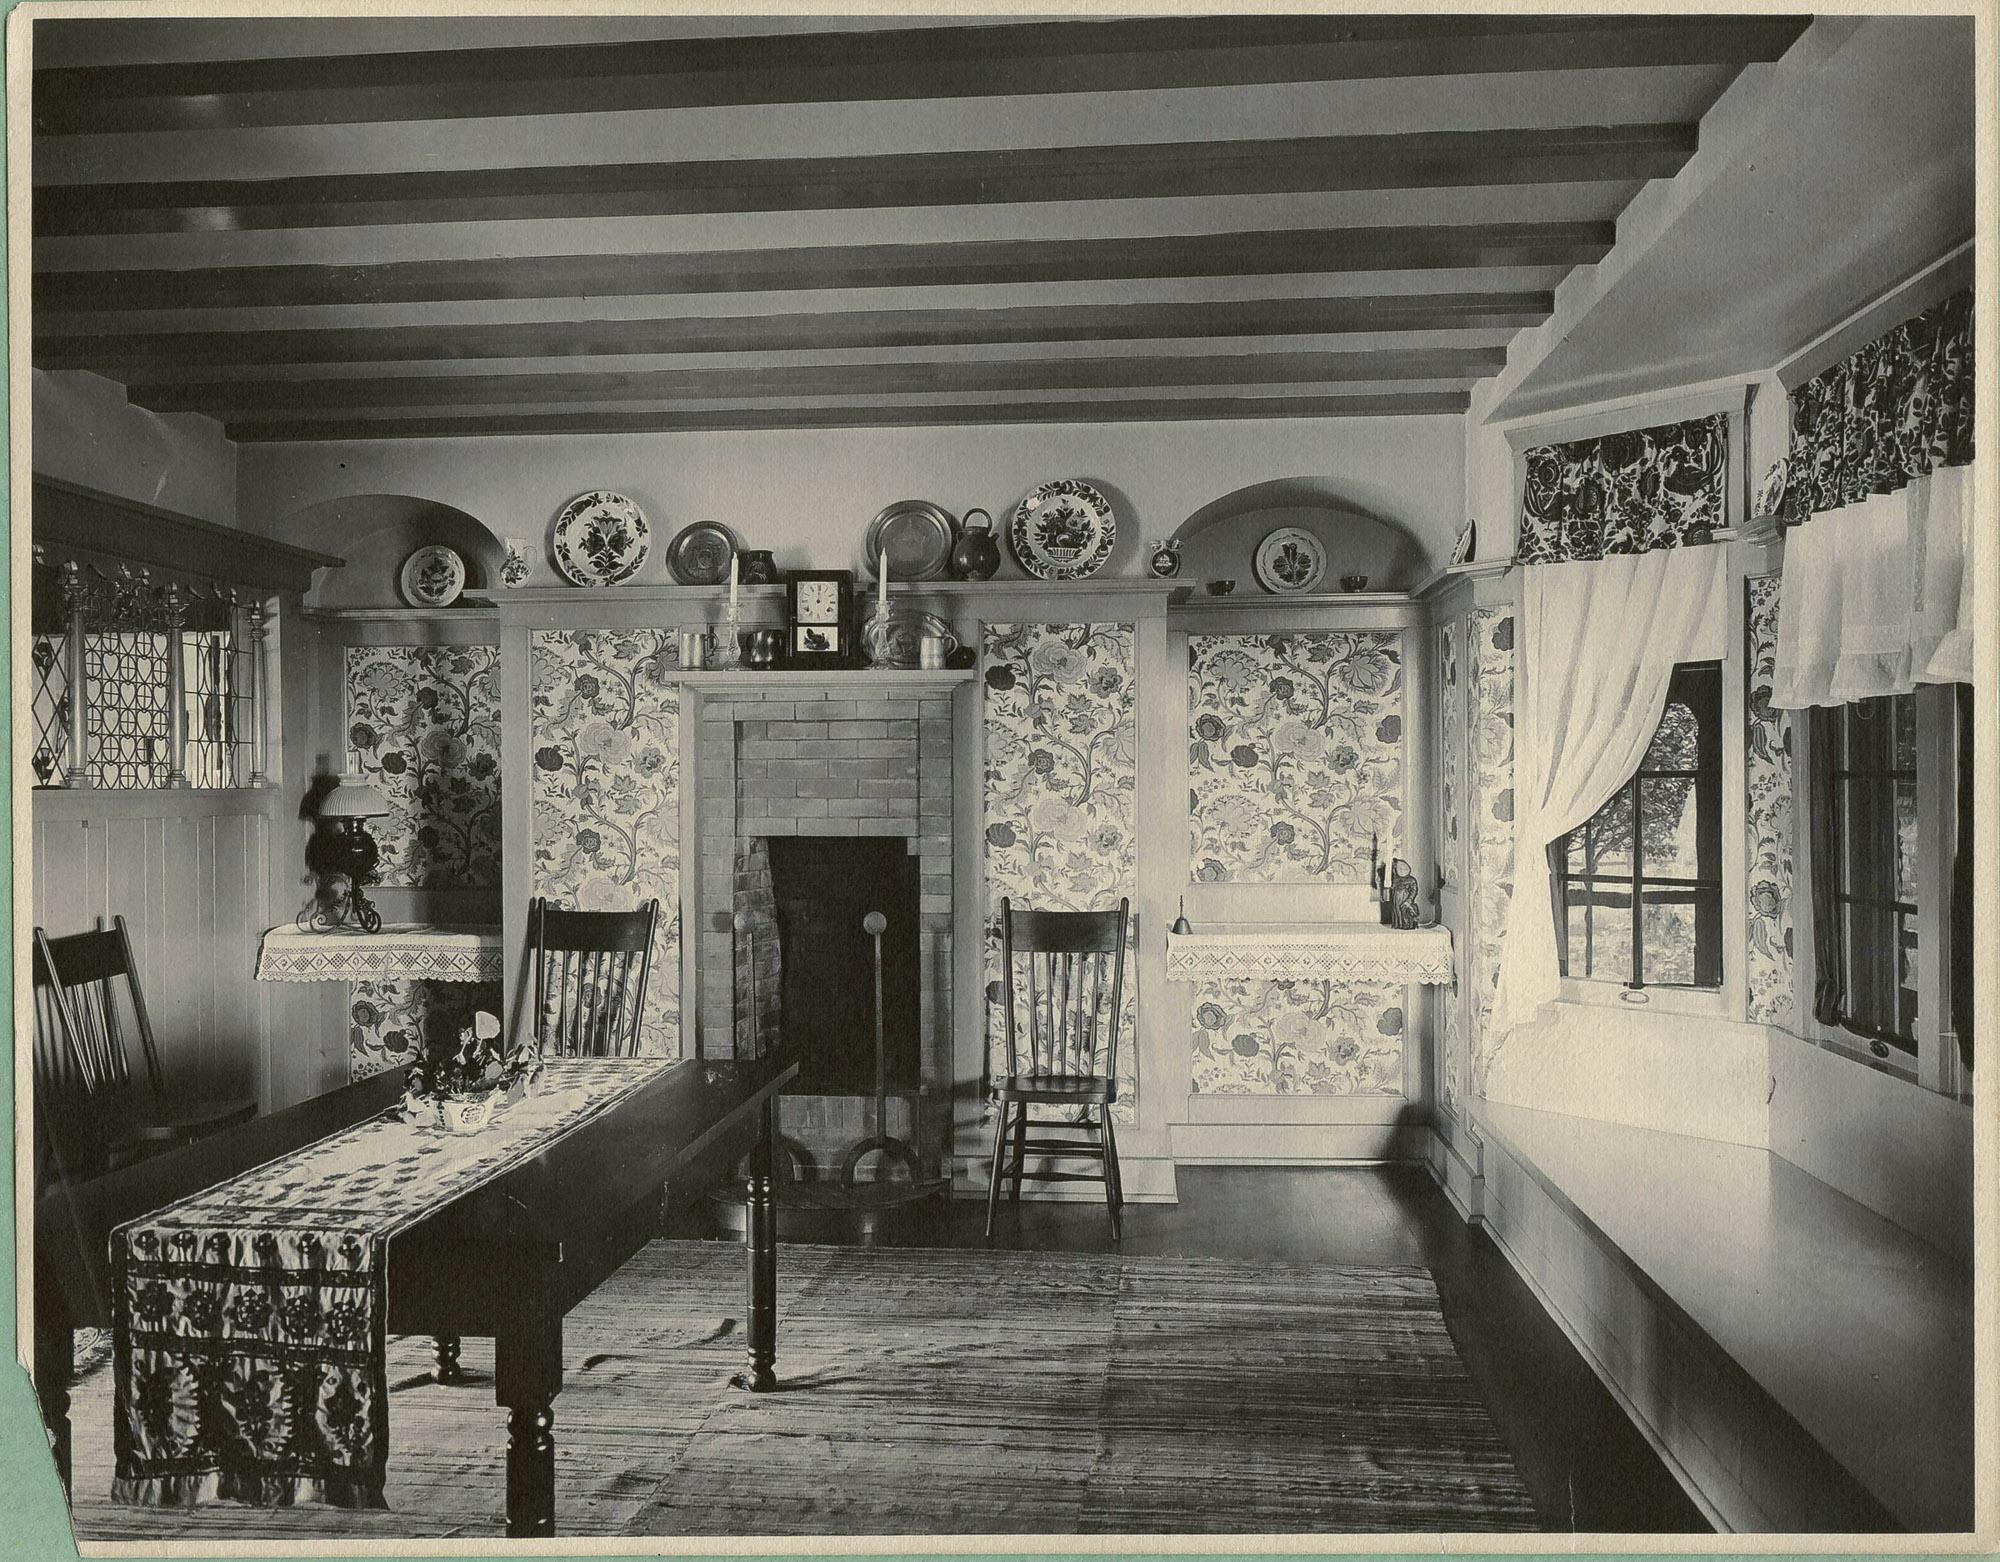 SB1_Trustworth_Ragdale dining room circa 1904_bjk